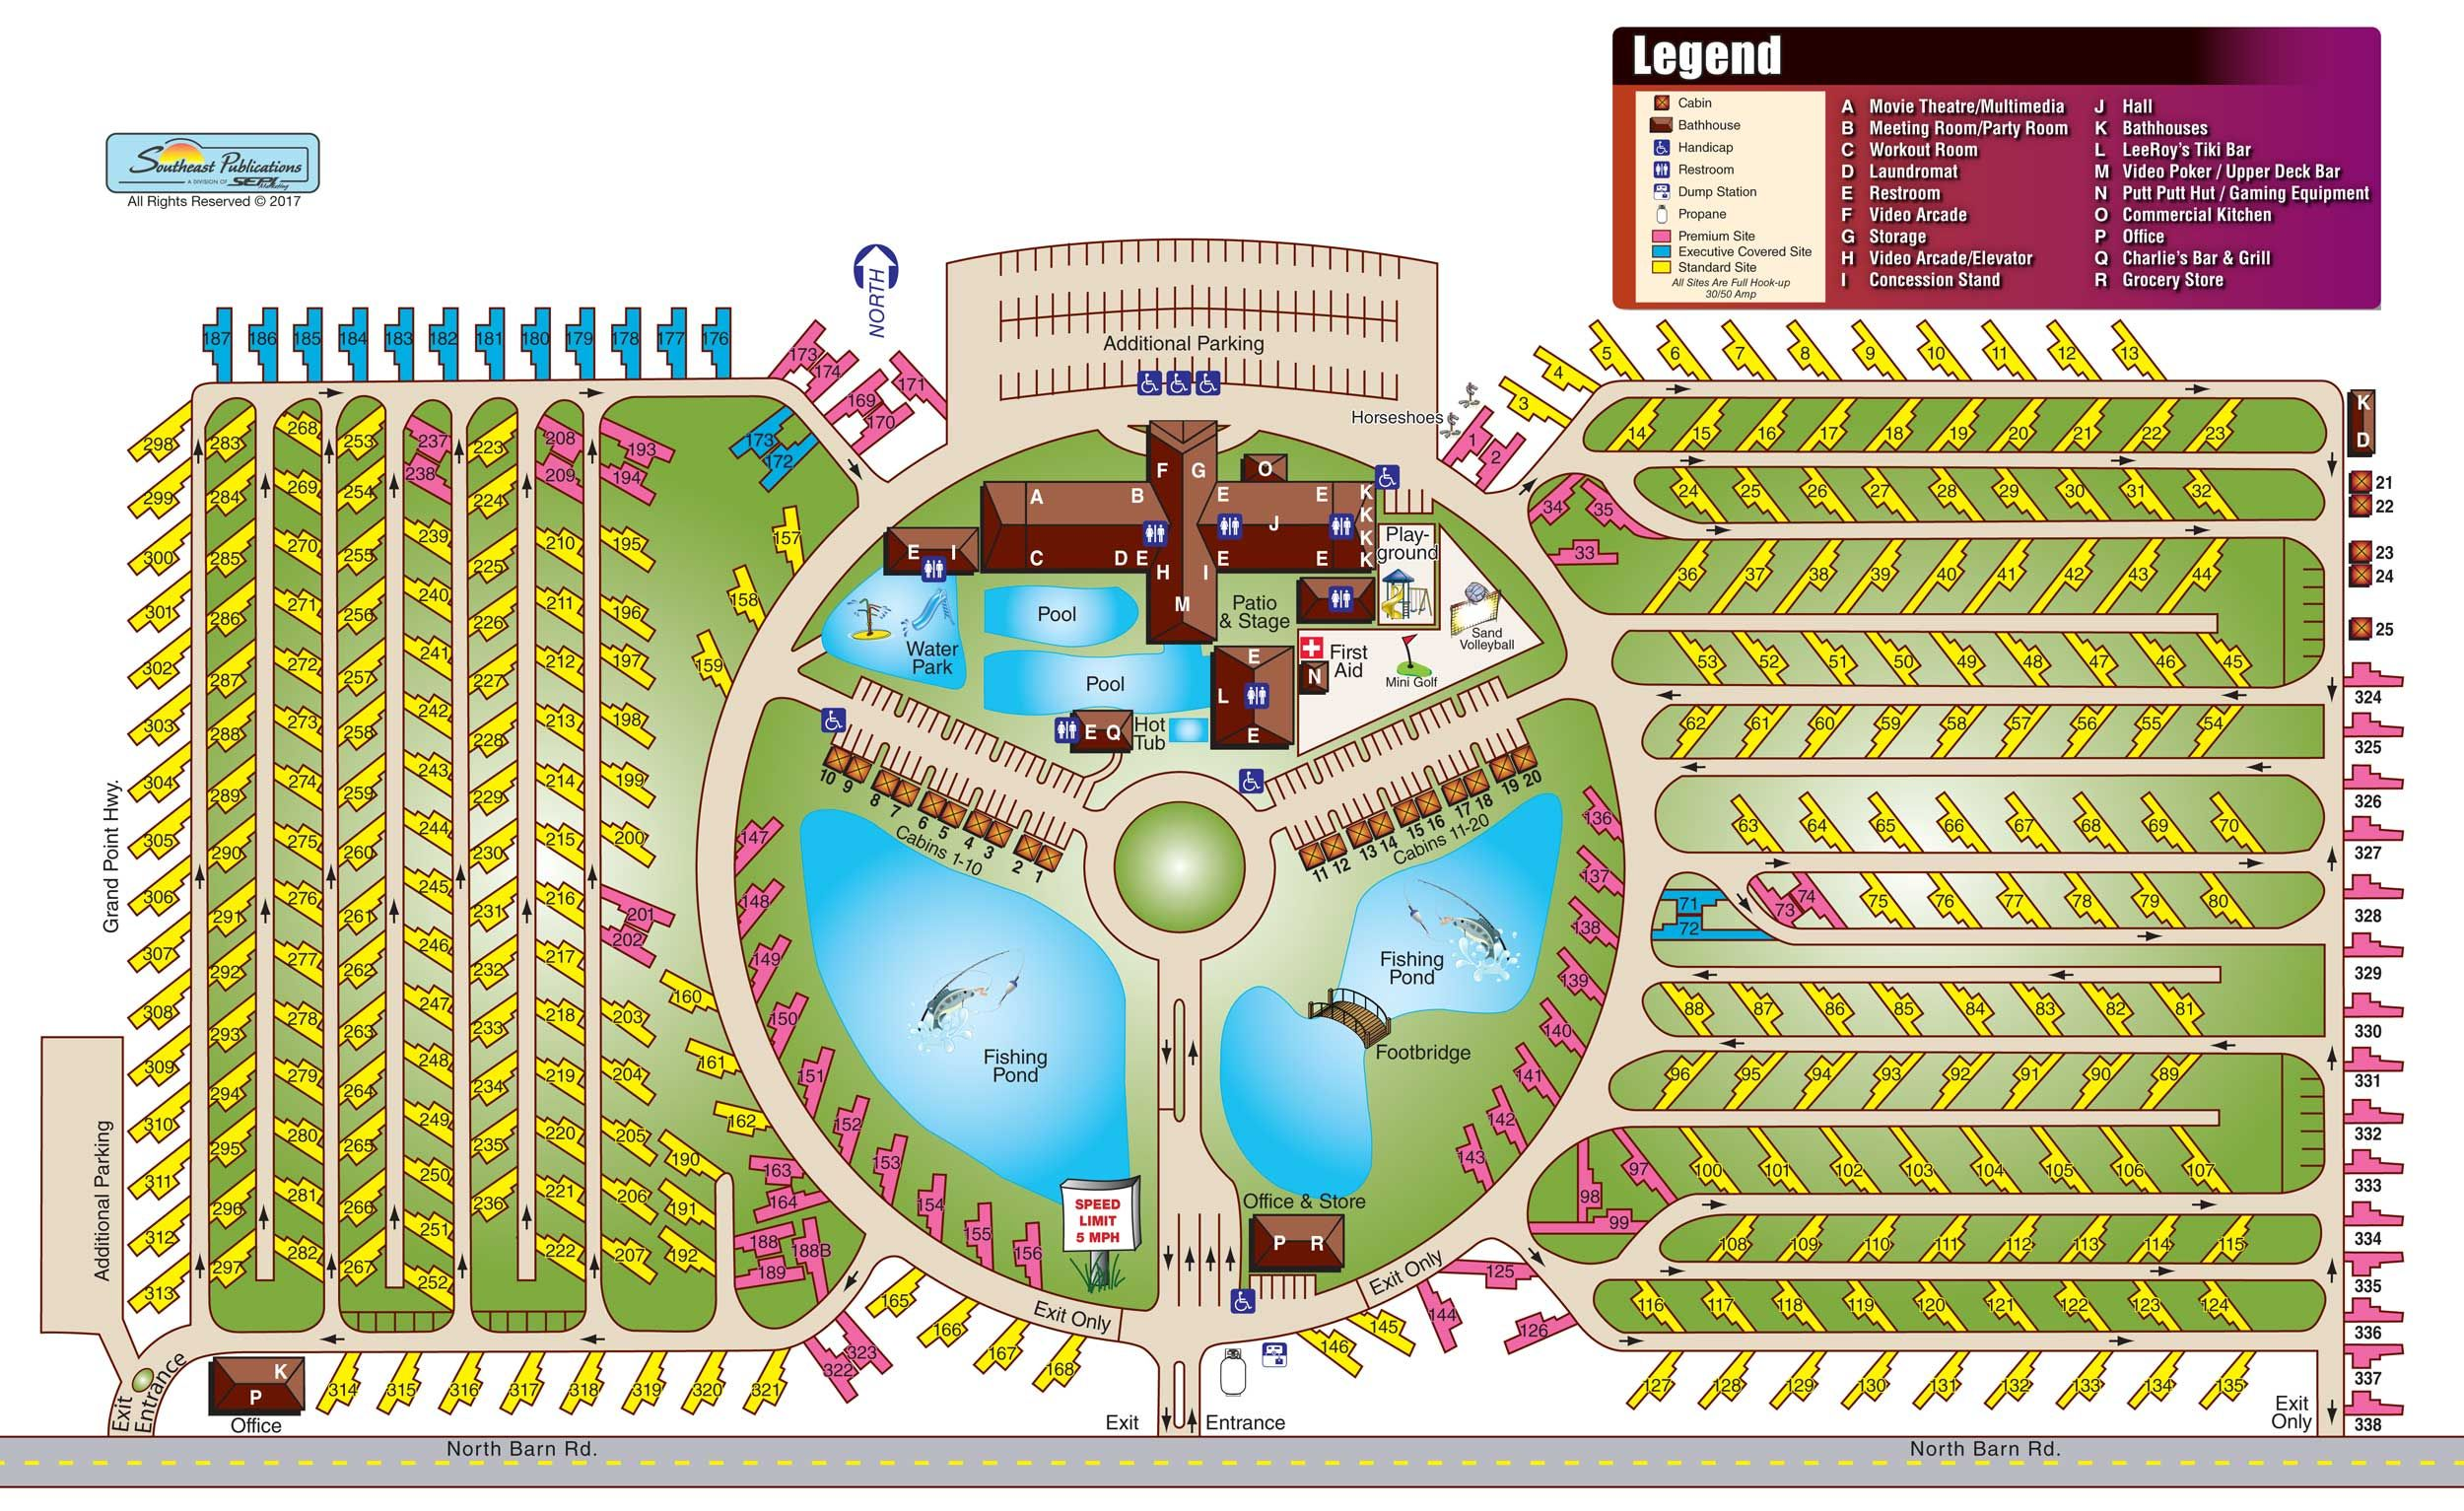 View Resort MapResort Map | Cajun Palms RV Resort | Find ... on cajun country cottages breaux bridge, pechanga rv resort map, southern palms rv resort map,